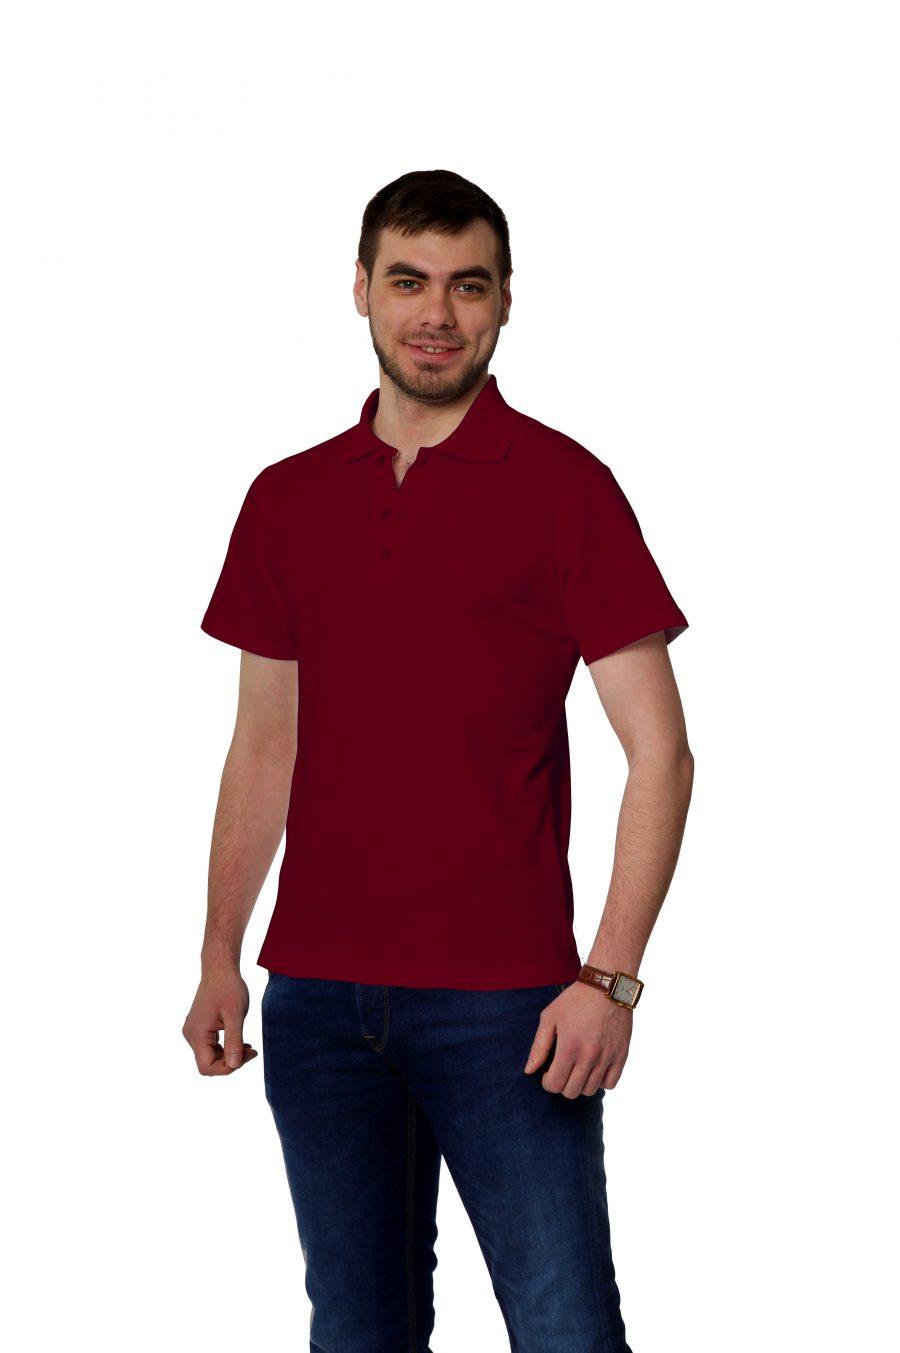 Рубашка-поло KANO MP цвет: бордо купить оптом,